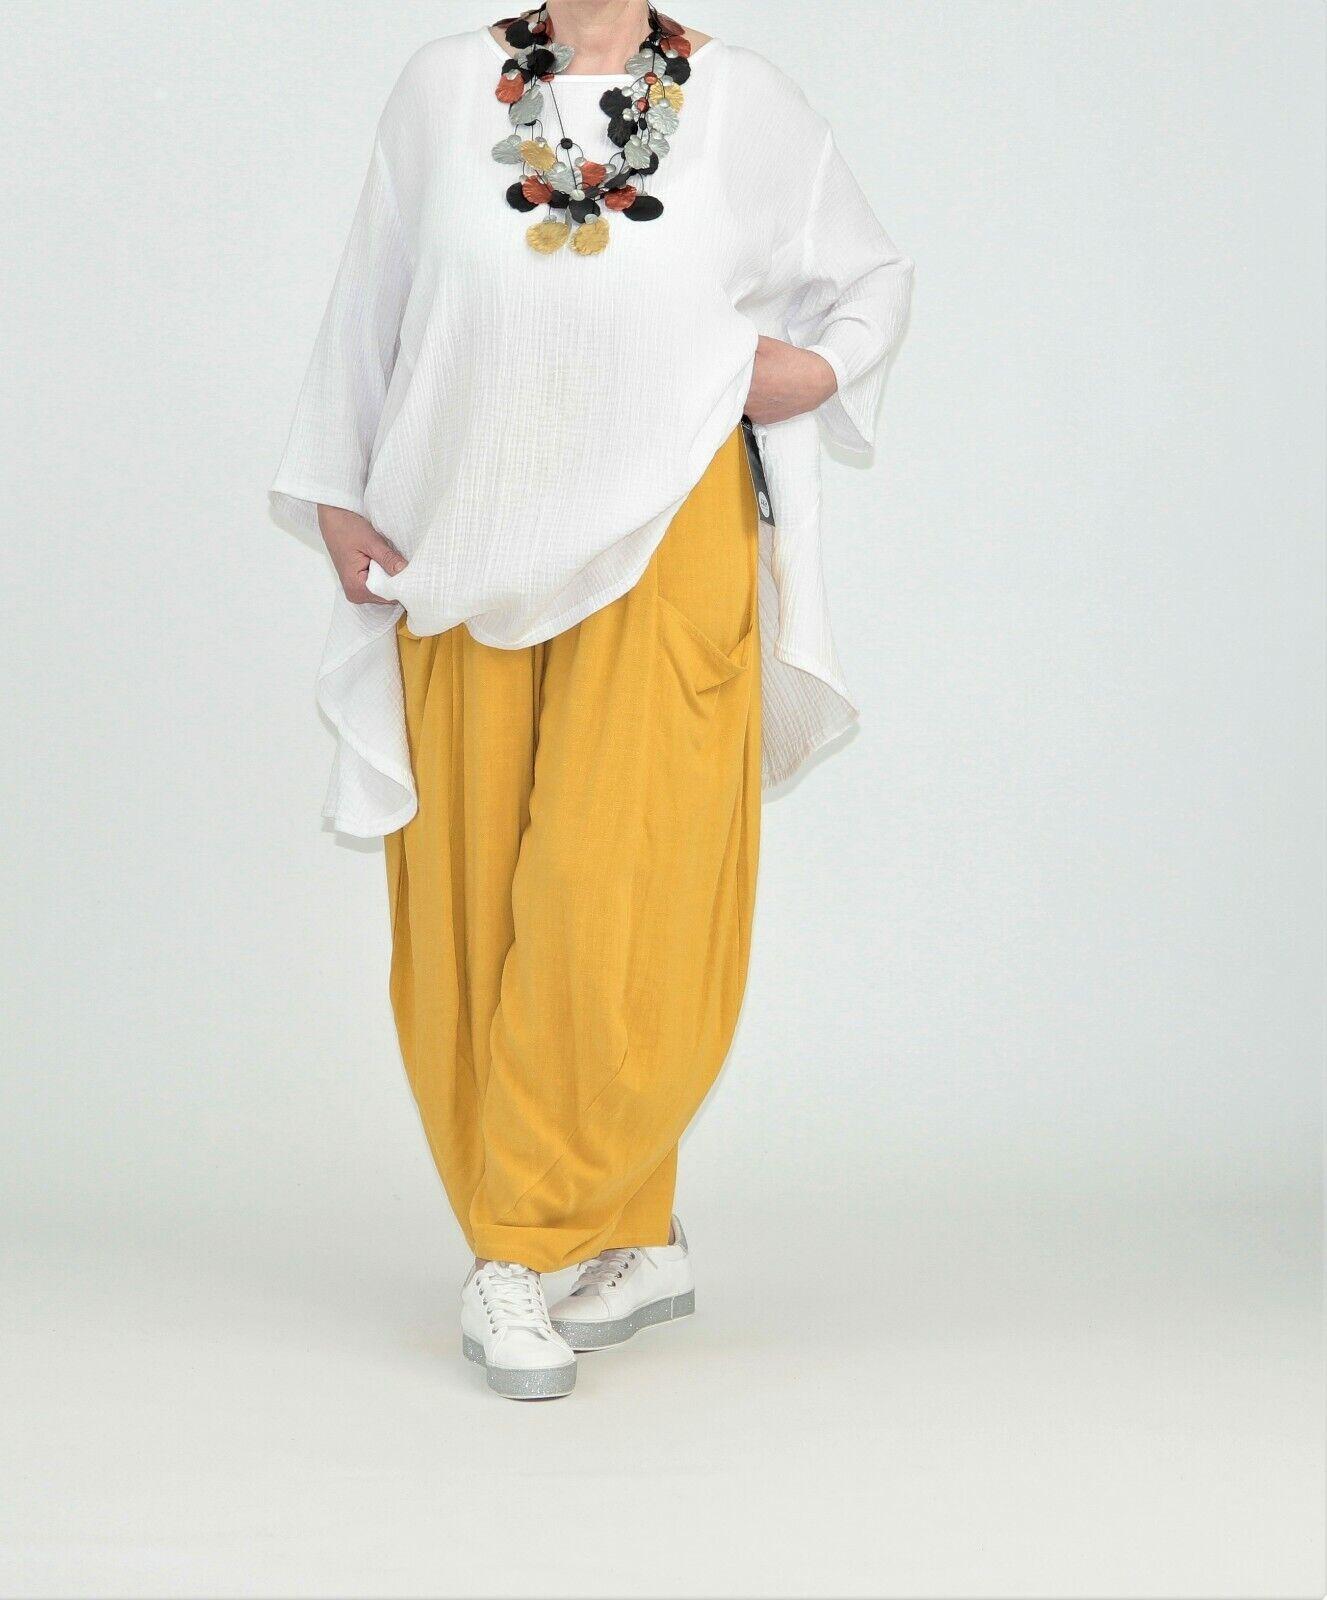 9f5ae9224e2211 ♢ 3 Farben AKH Fashion Leinen-Ballon-Hose EG 44,46,48,50,52,54 ♢  nskiop833-Hosen